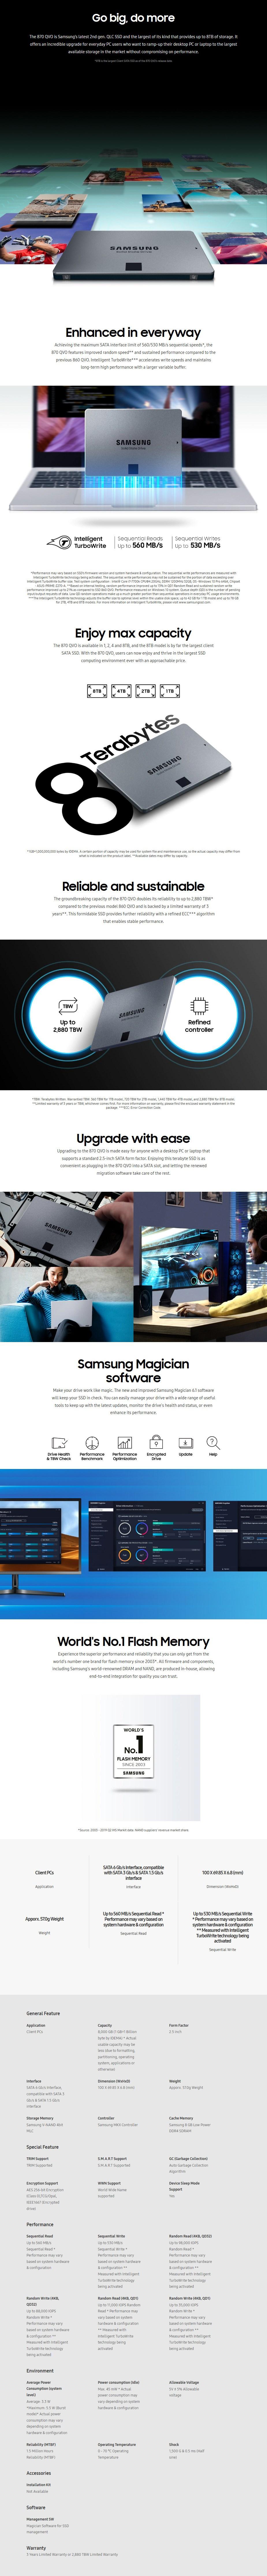 "Samsung 870 QVO 8TB 2.5"" SATA III 6GB/s 4-Bit MLC V-NAND SSD MZ-77Q8T0BW - Overview 1"